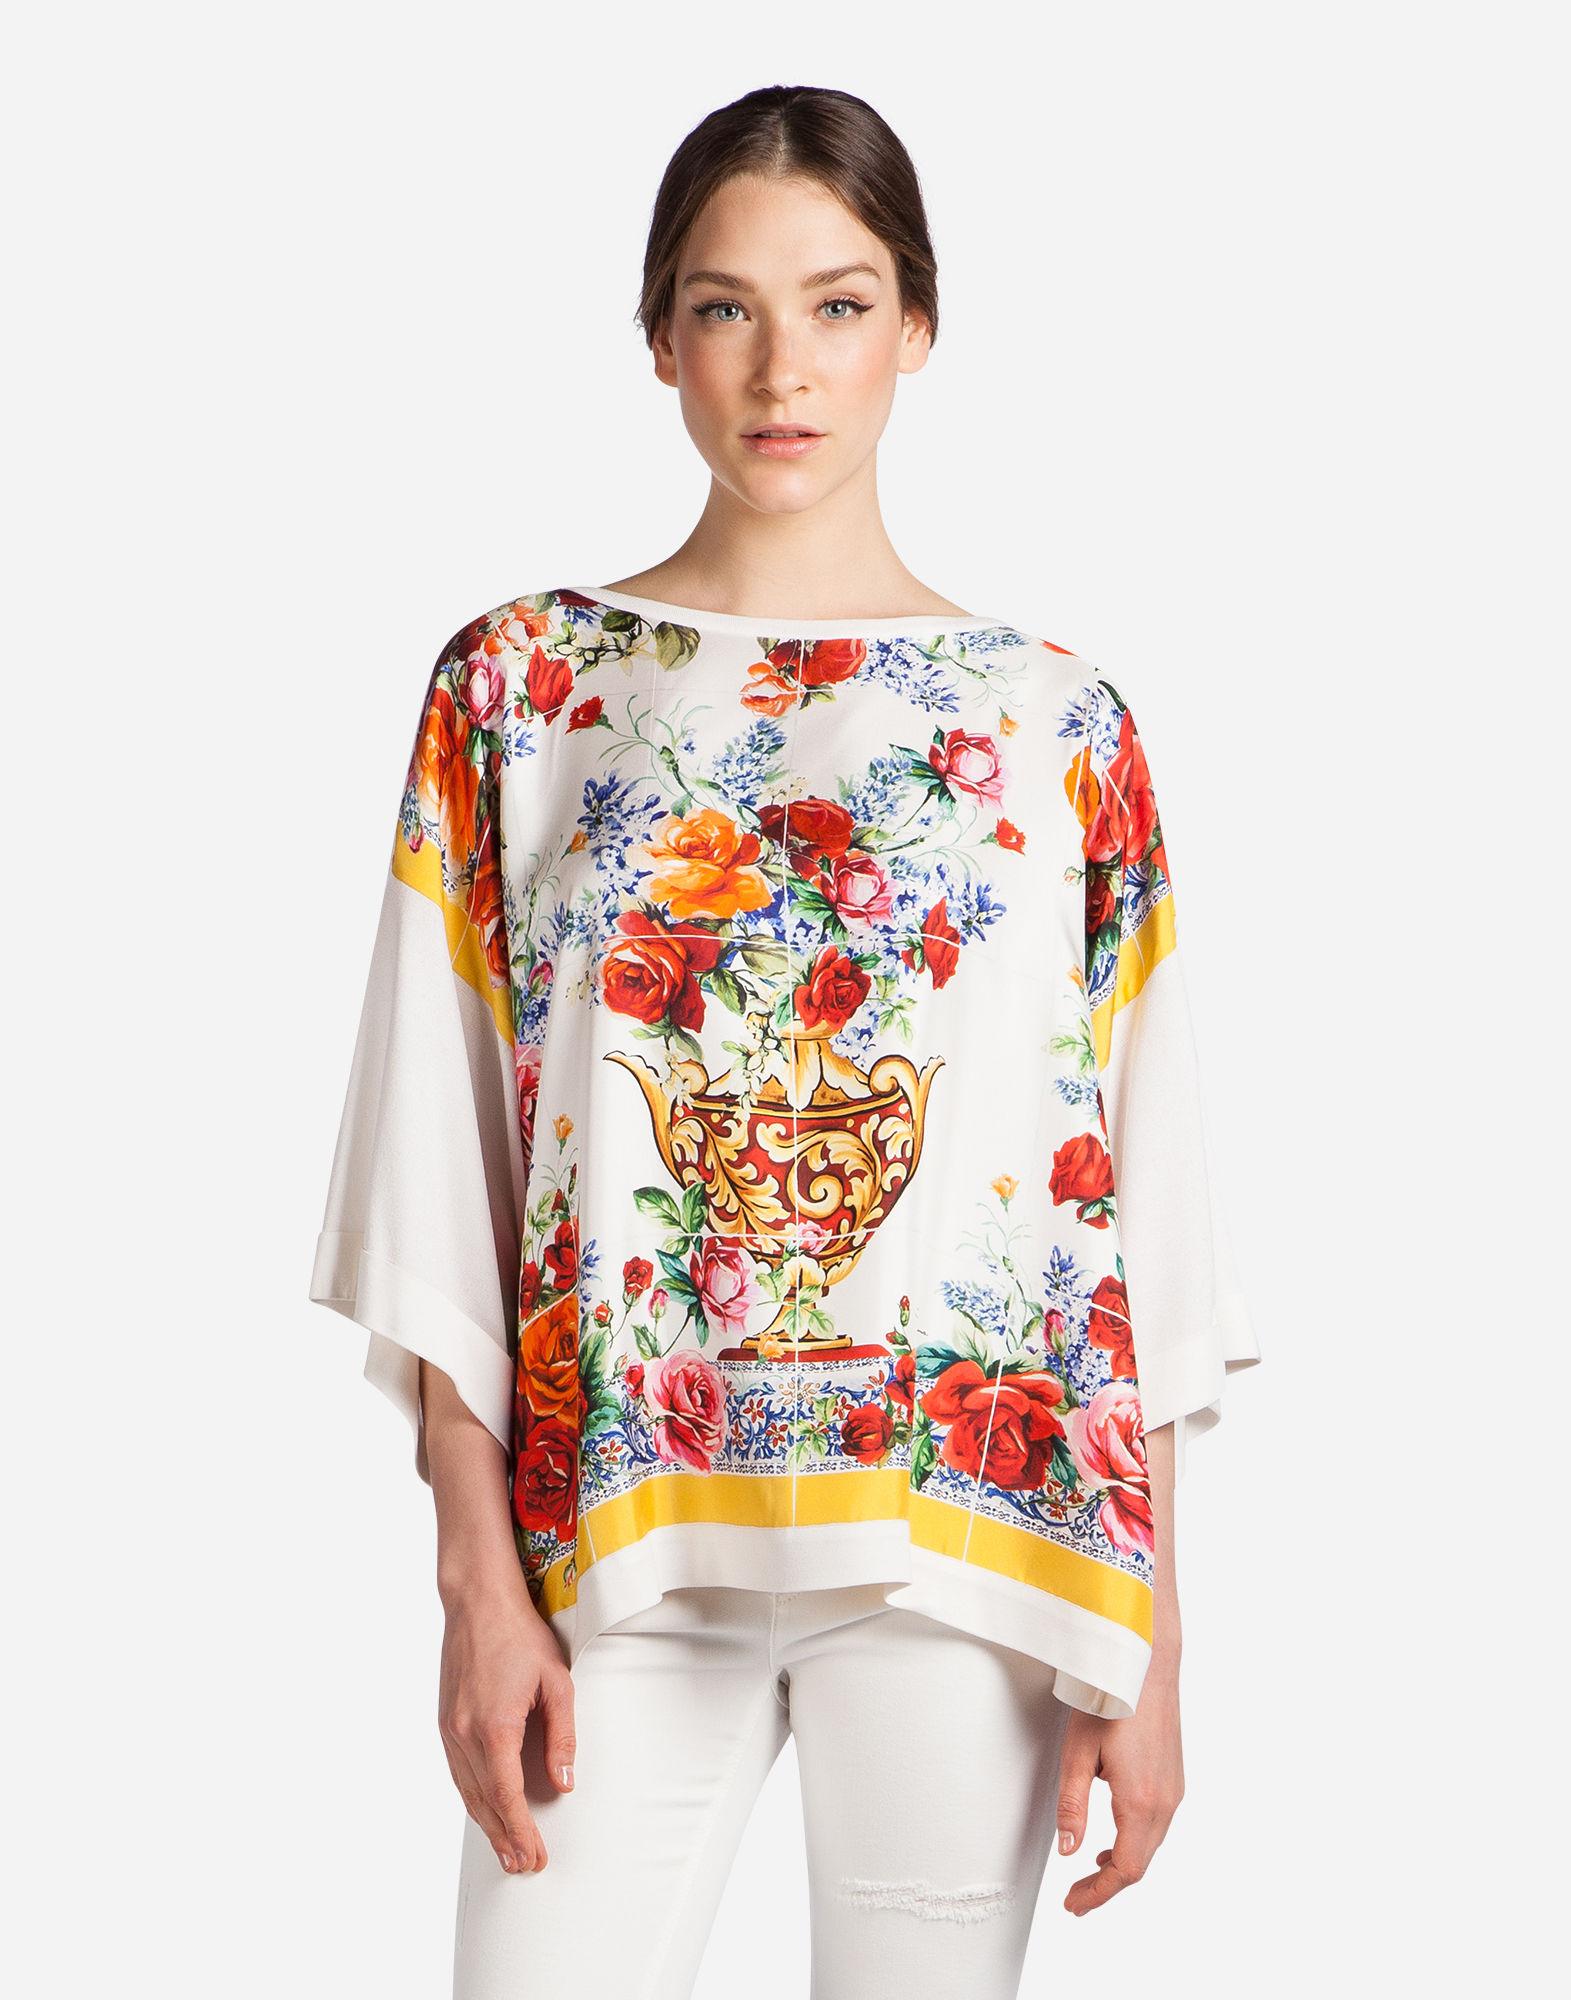 Dolce & Gabbana Sweatshirt With Silk Foulard Insert In Multicolor